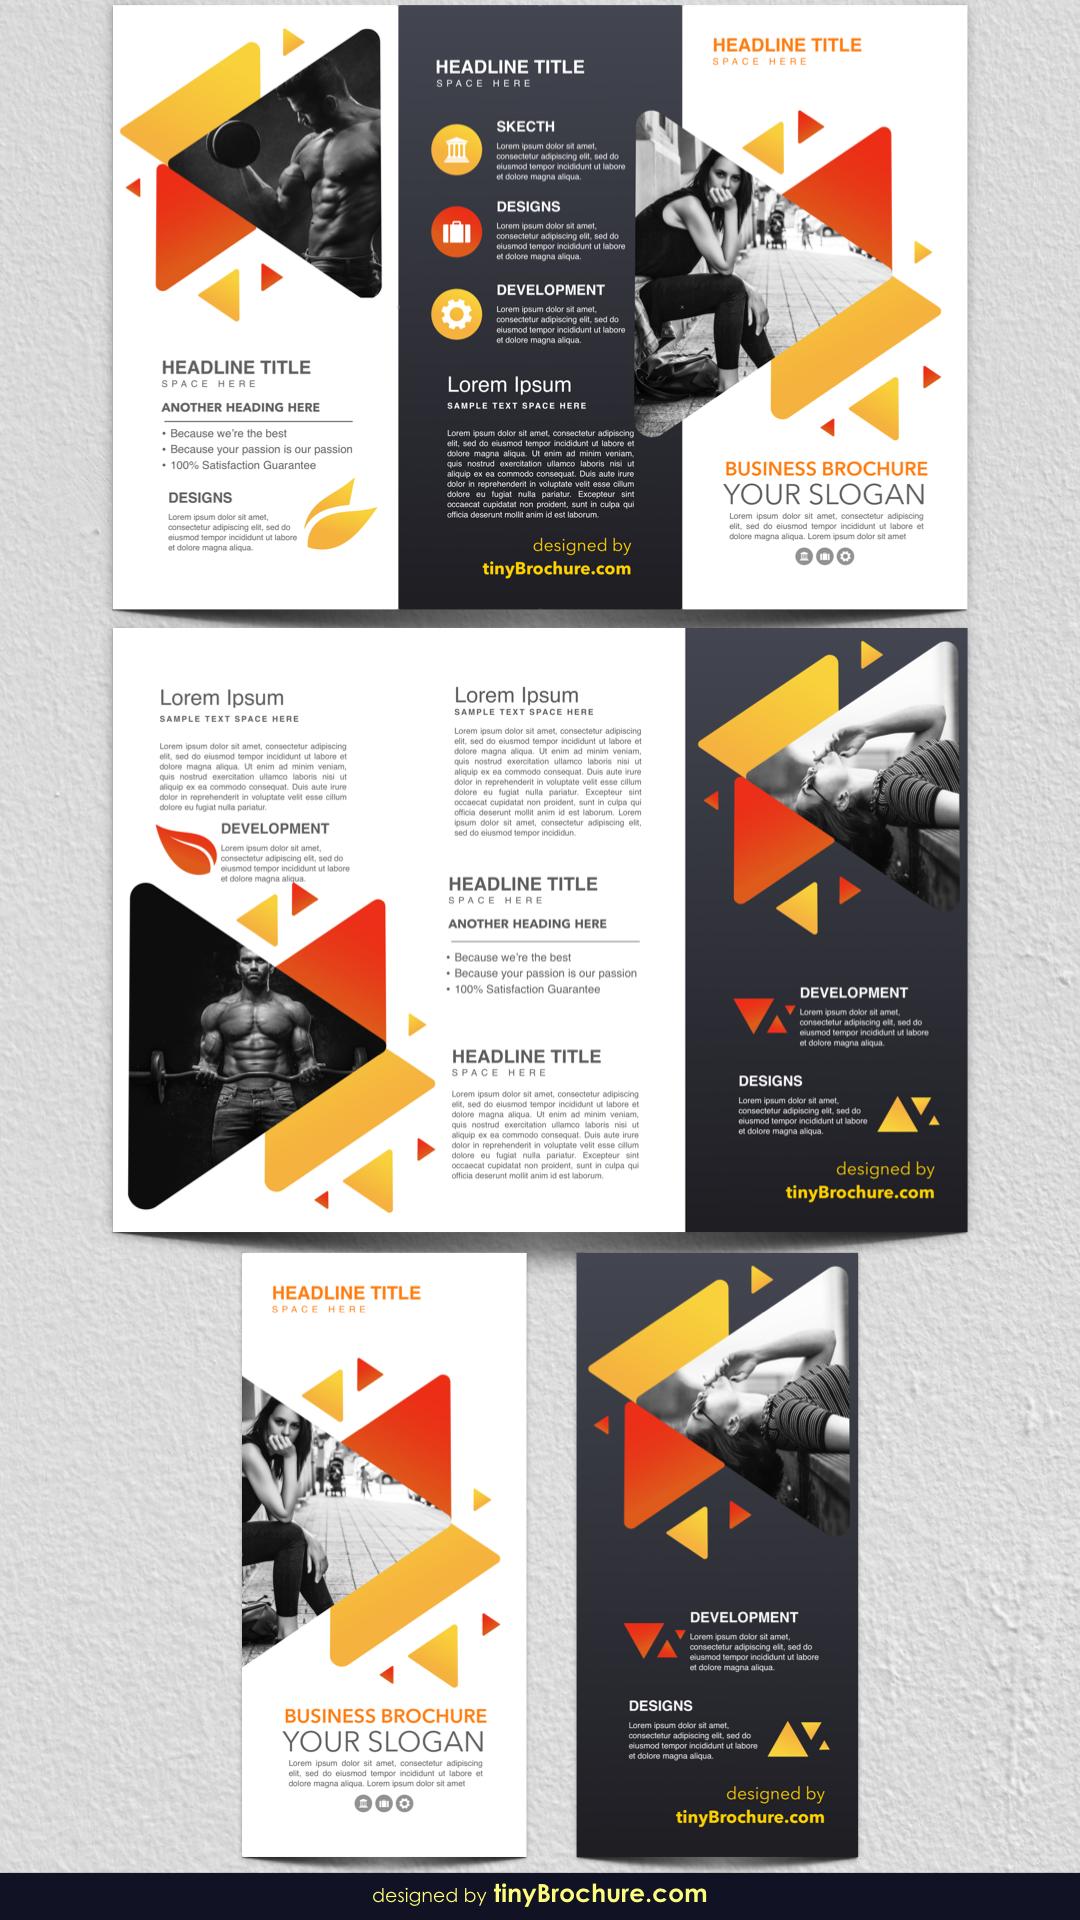 3 Panel Brochure Template Google Docs 2019 Rack Card Designs Pertaining To Three Pan Brochure Design Template Brochure Design Creative Brochure Design Layout